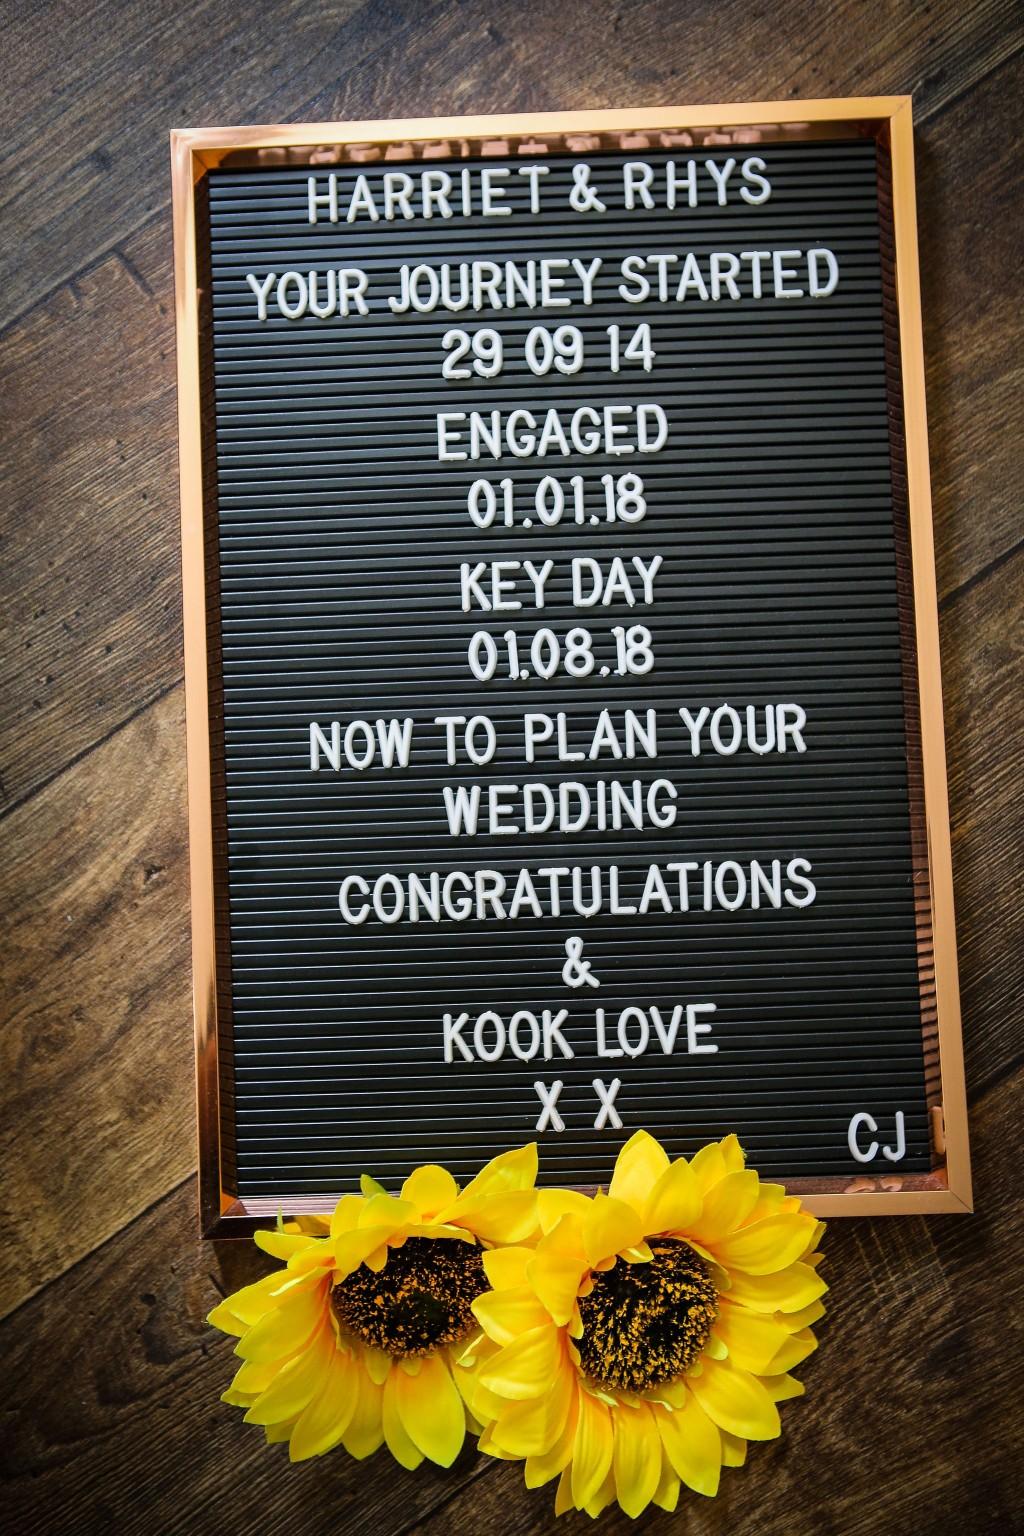 Harriet&Rhys Wedding - Magical sunflower wedding - sunflower key events timeline